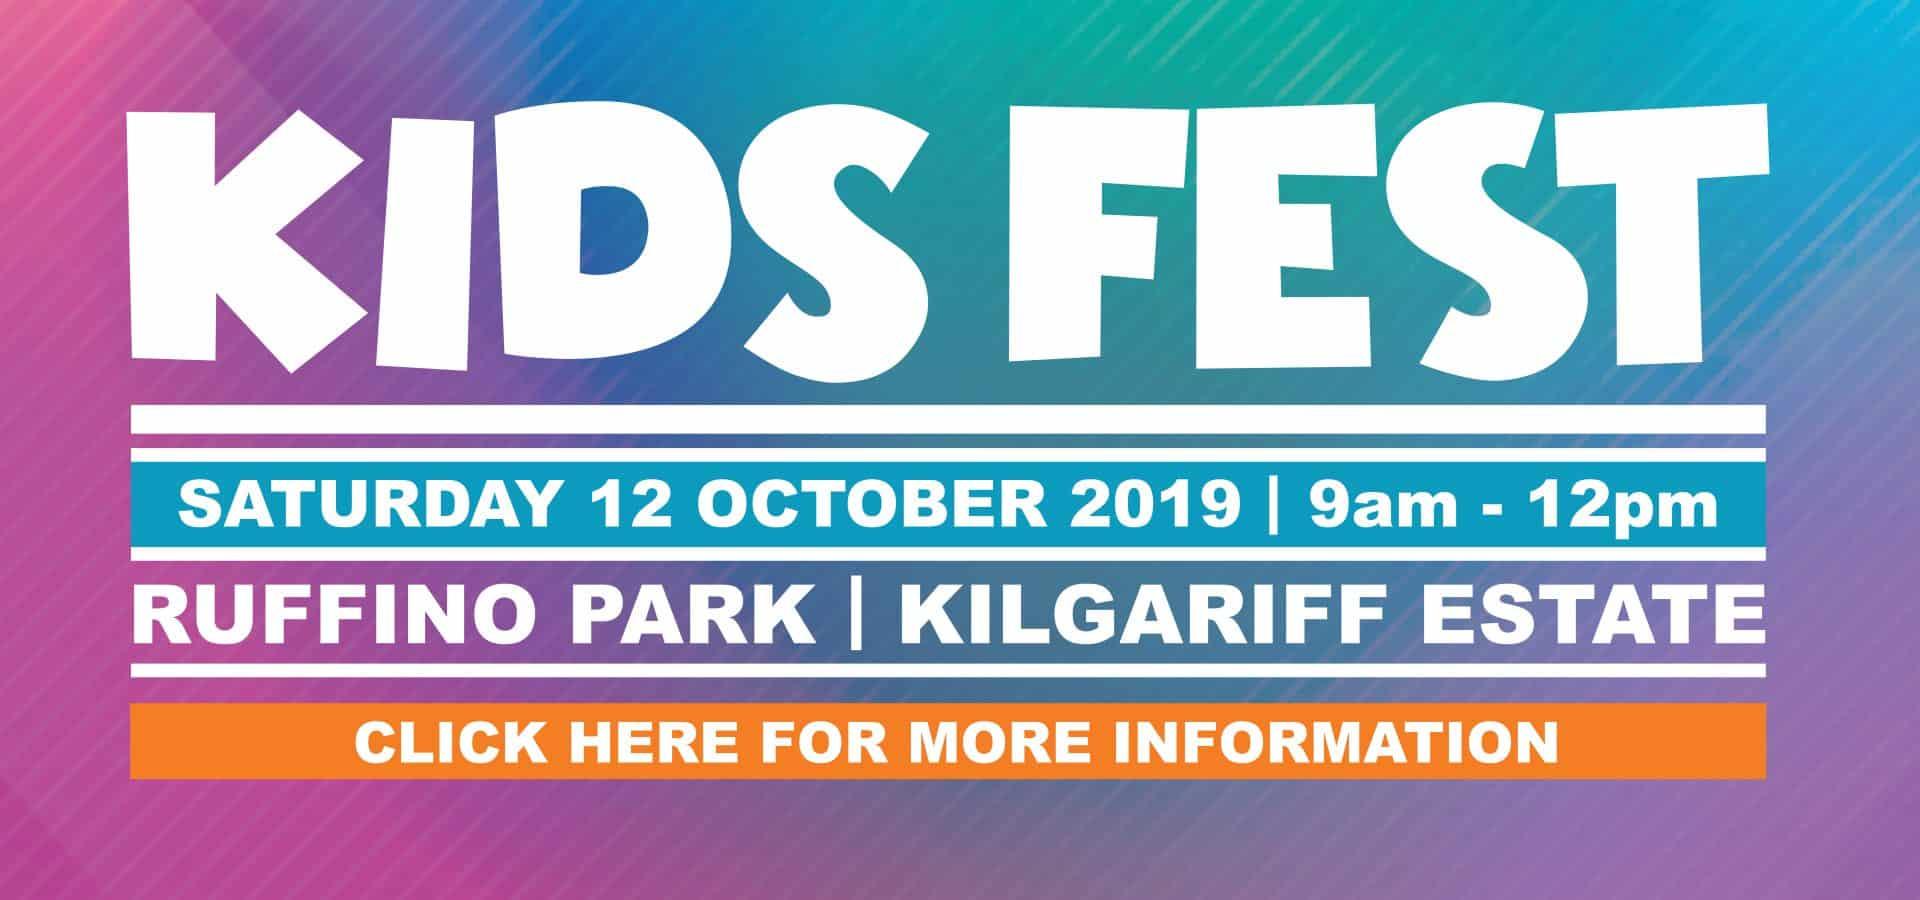 kidsfest-kilgariff-web